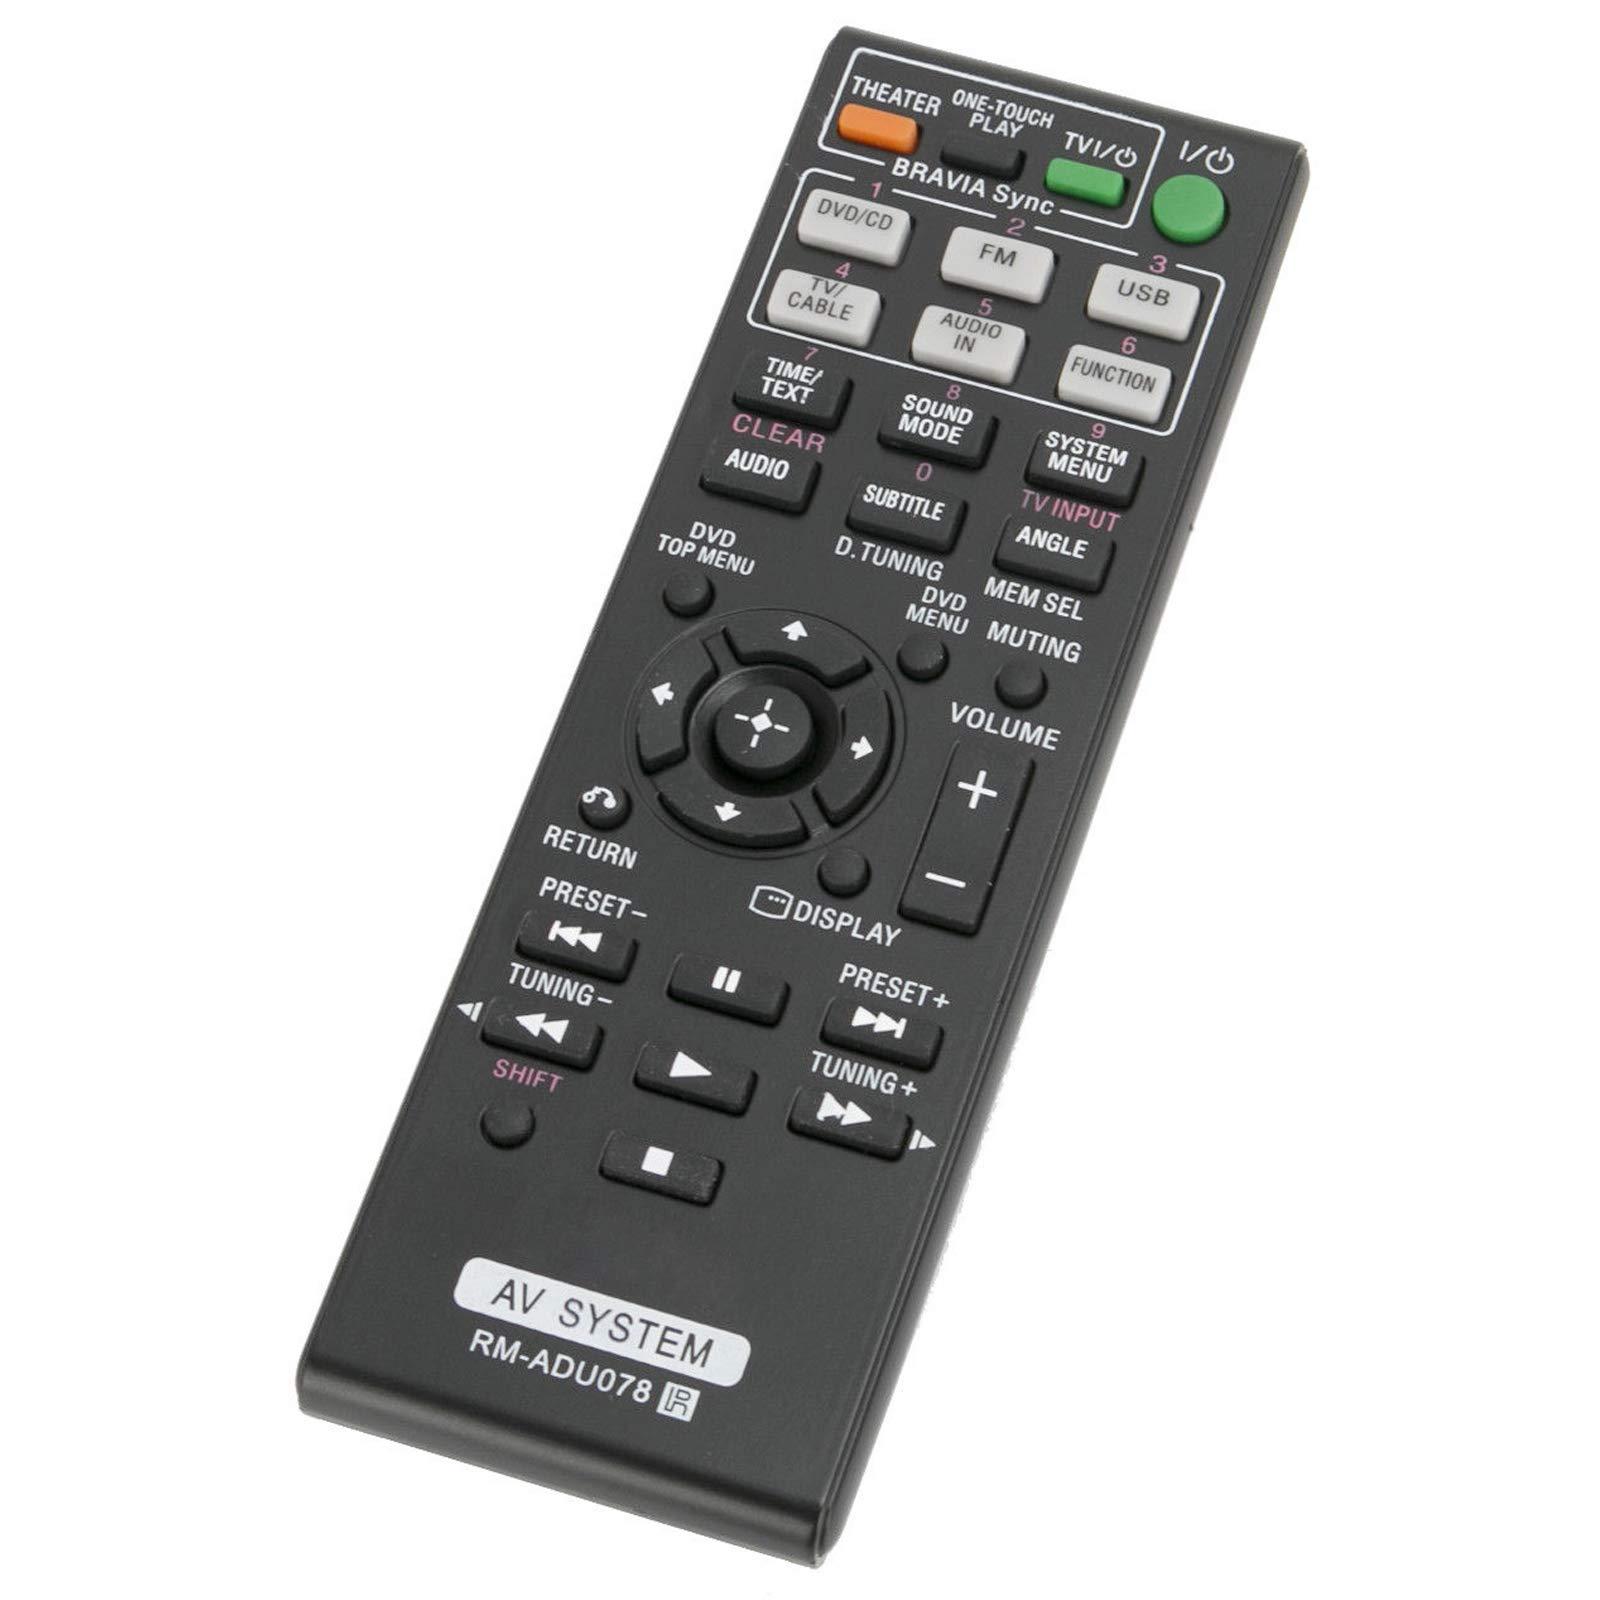 Control Remoto Rm Adu078 Rmadu078 Sony Dvd Home Theater A...